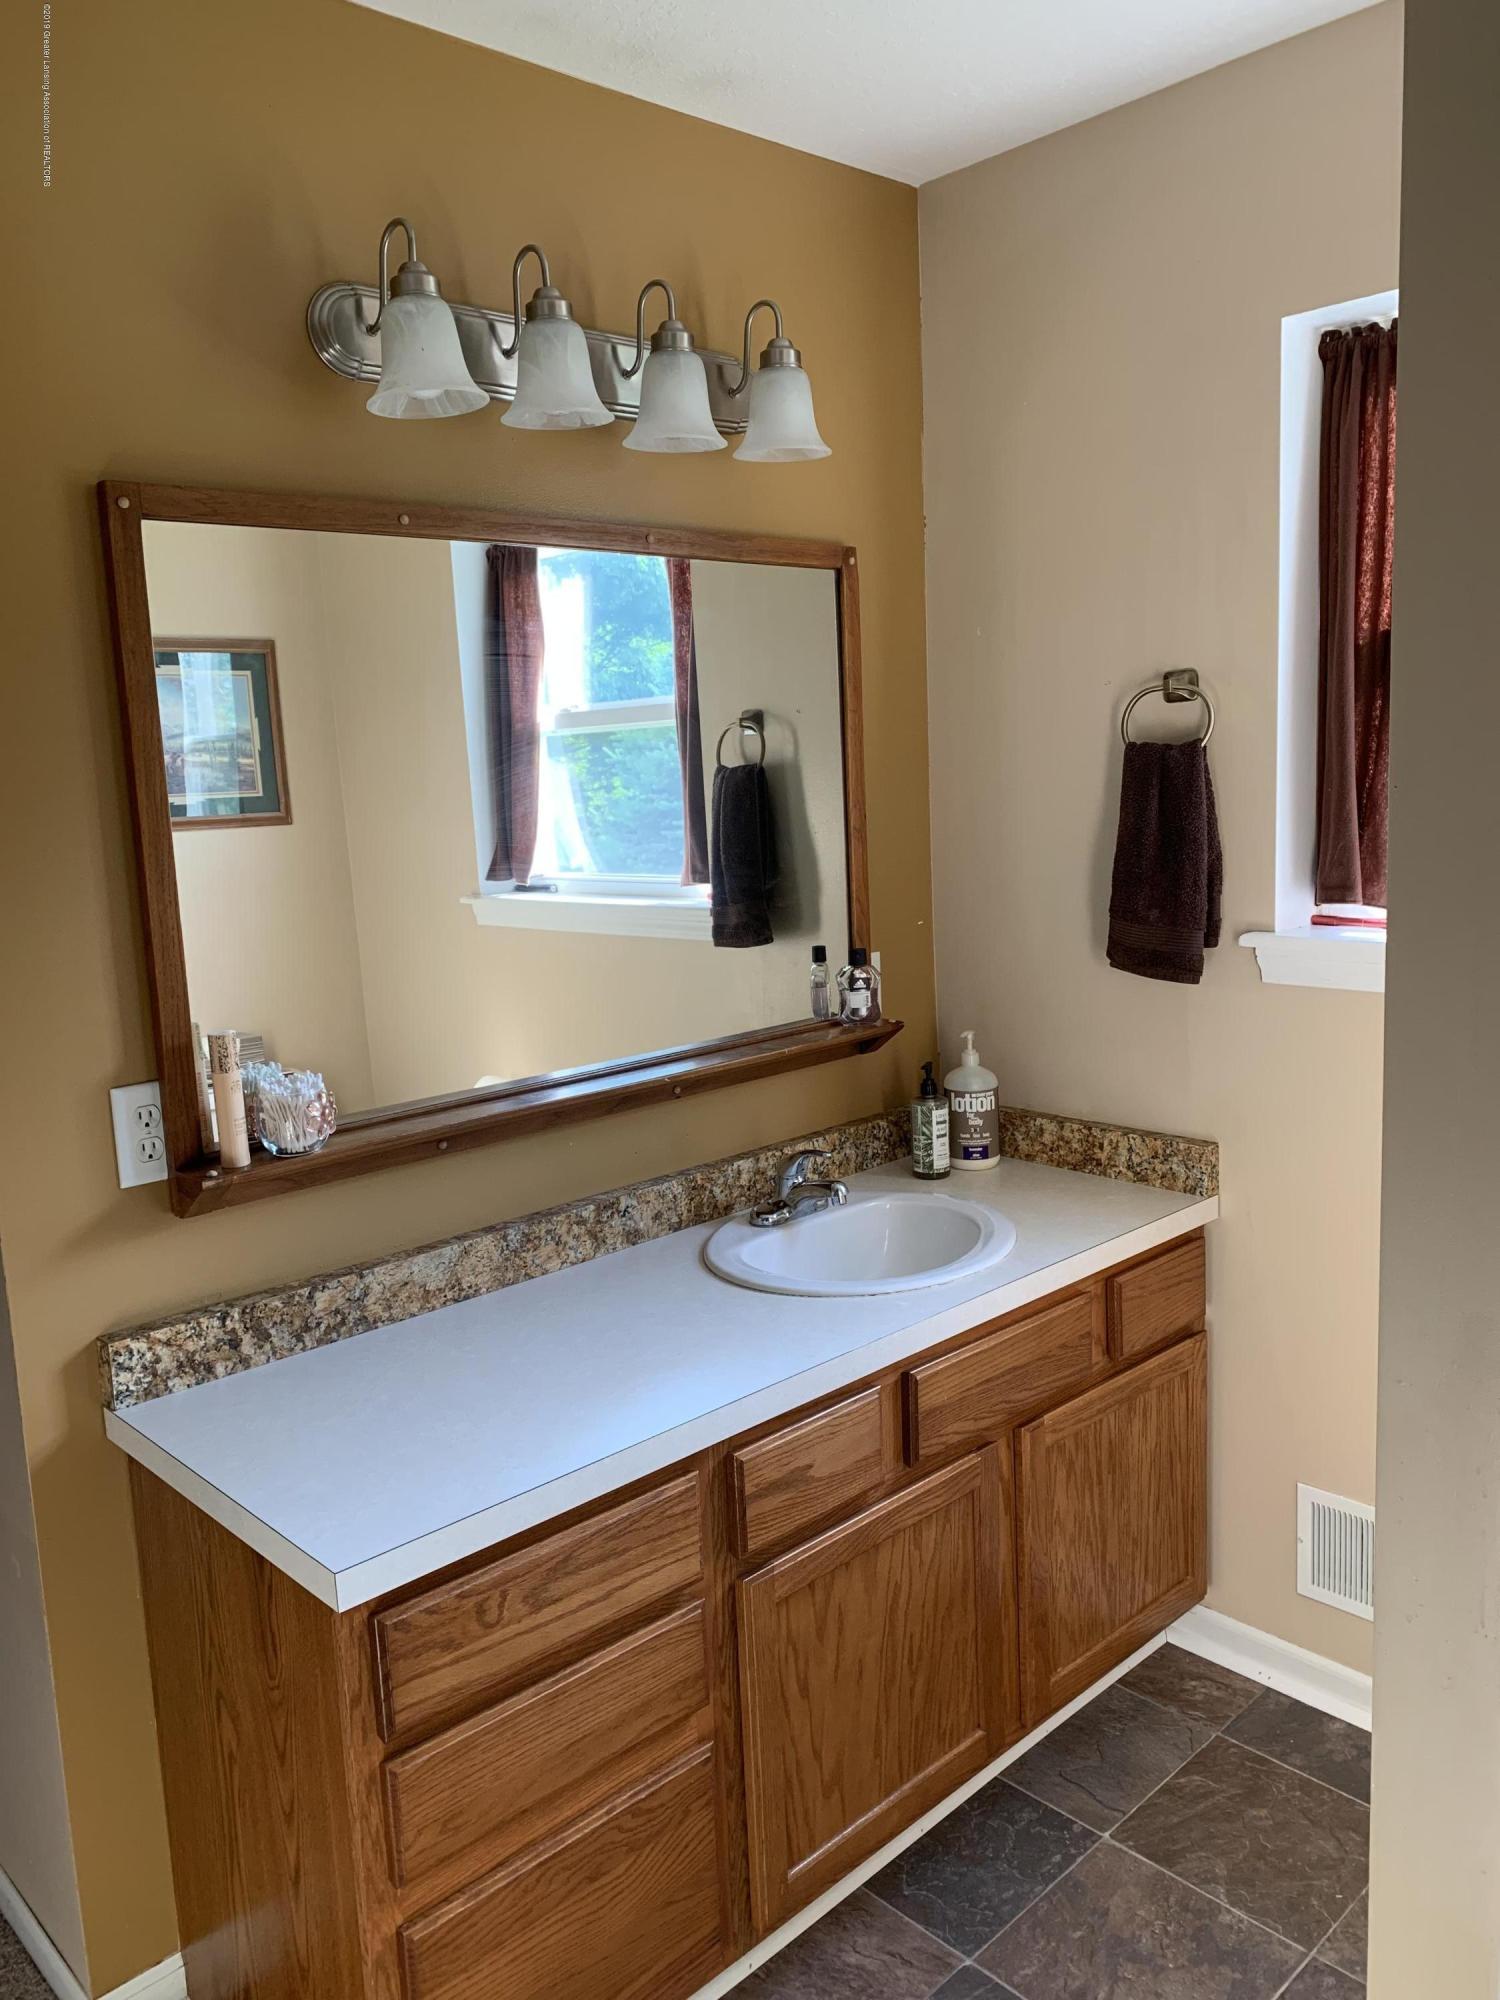 4157 W Roosevelt Rd - Master Bath 7 - 24